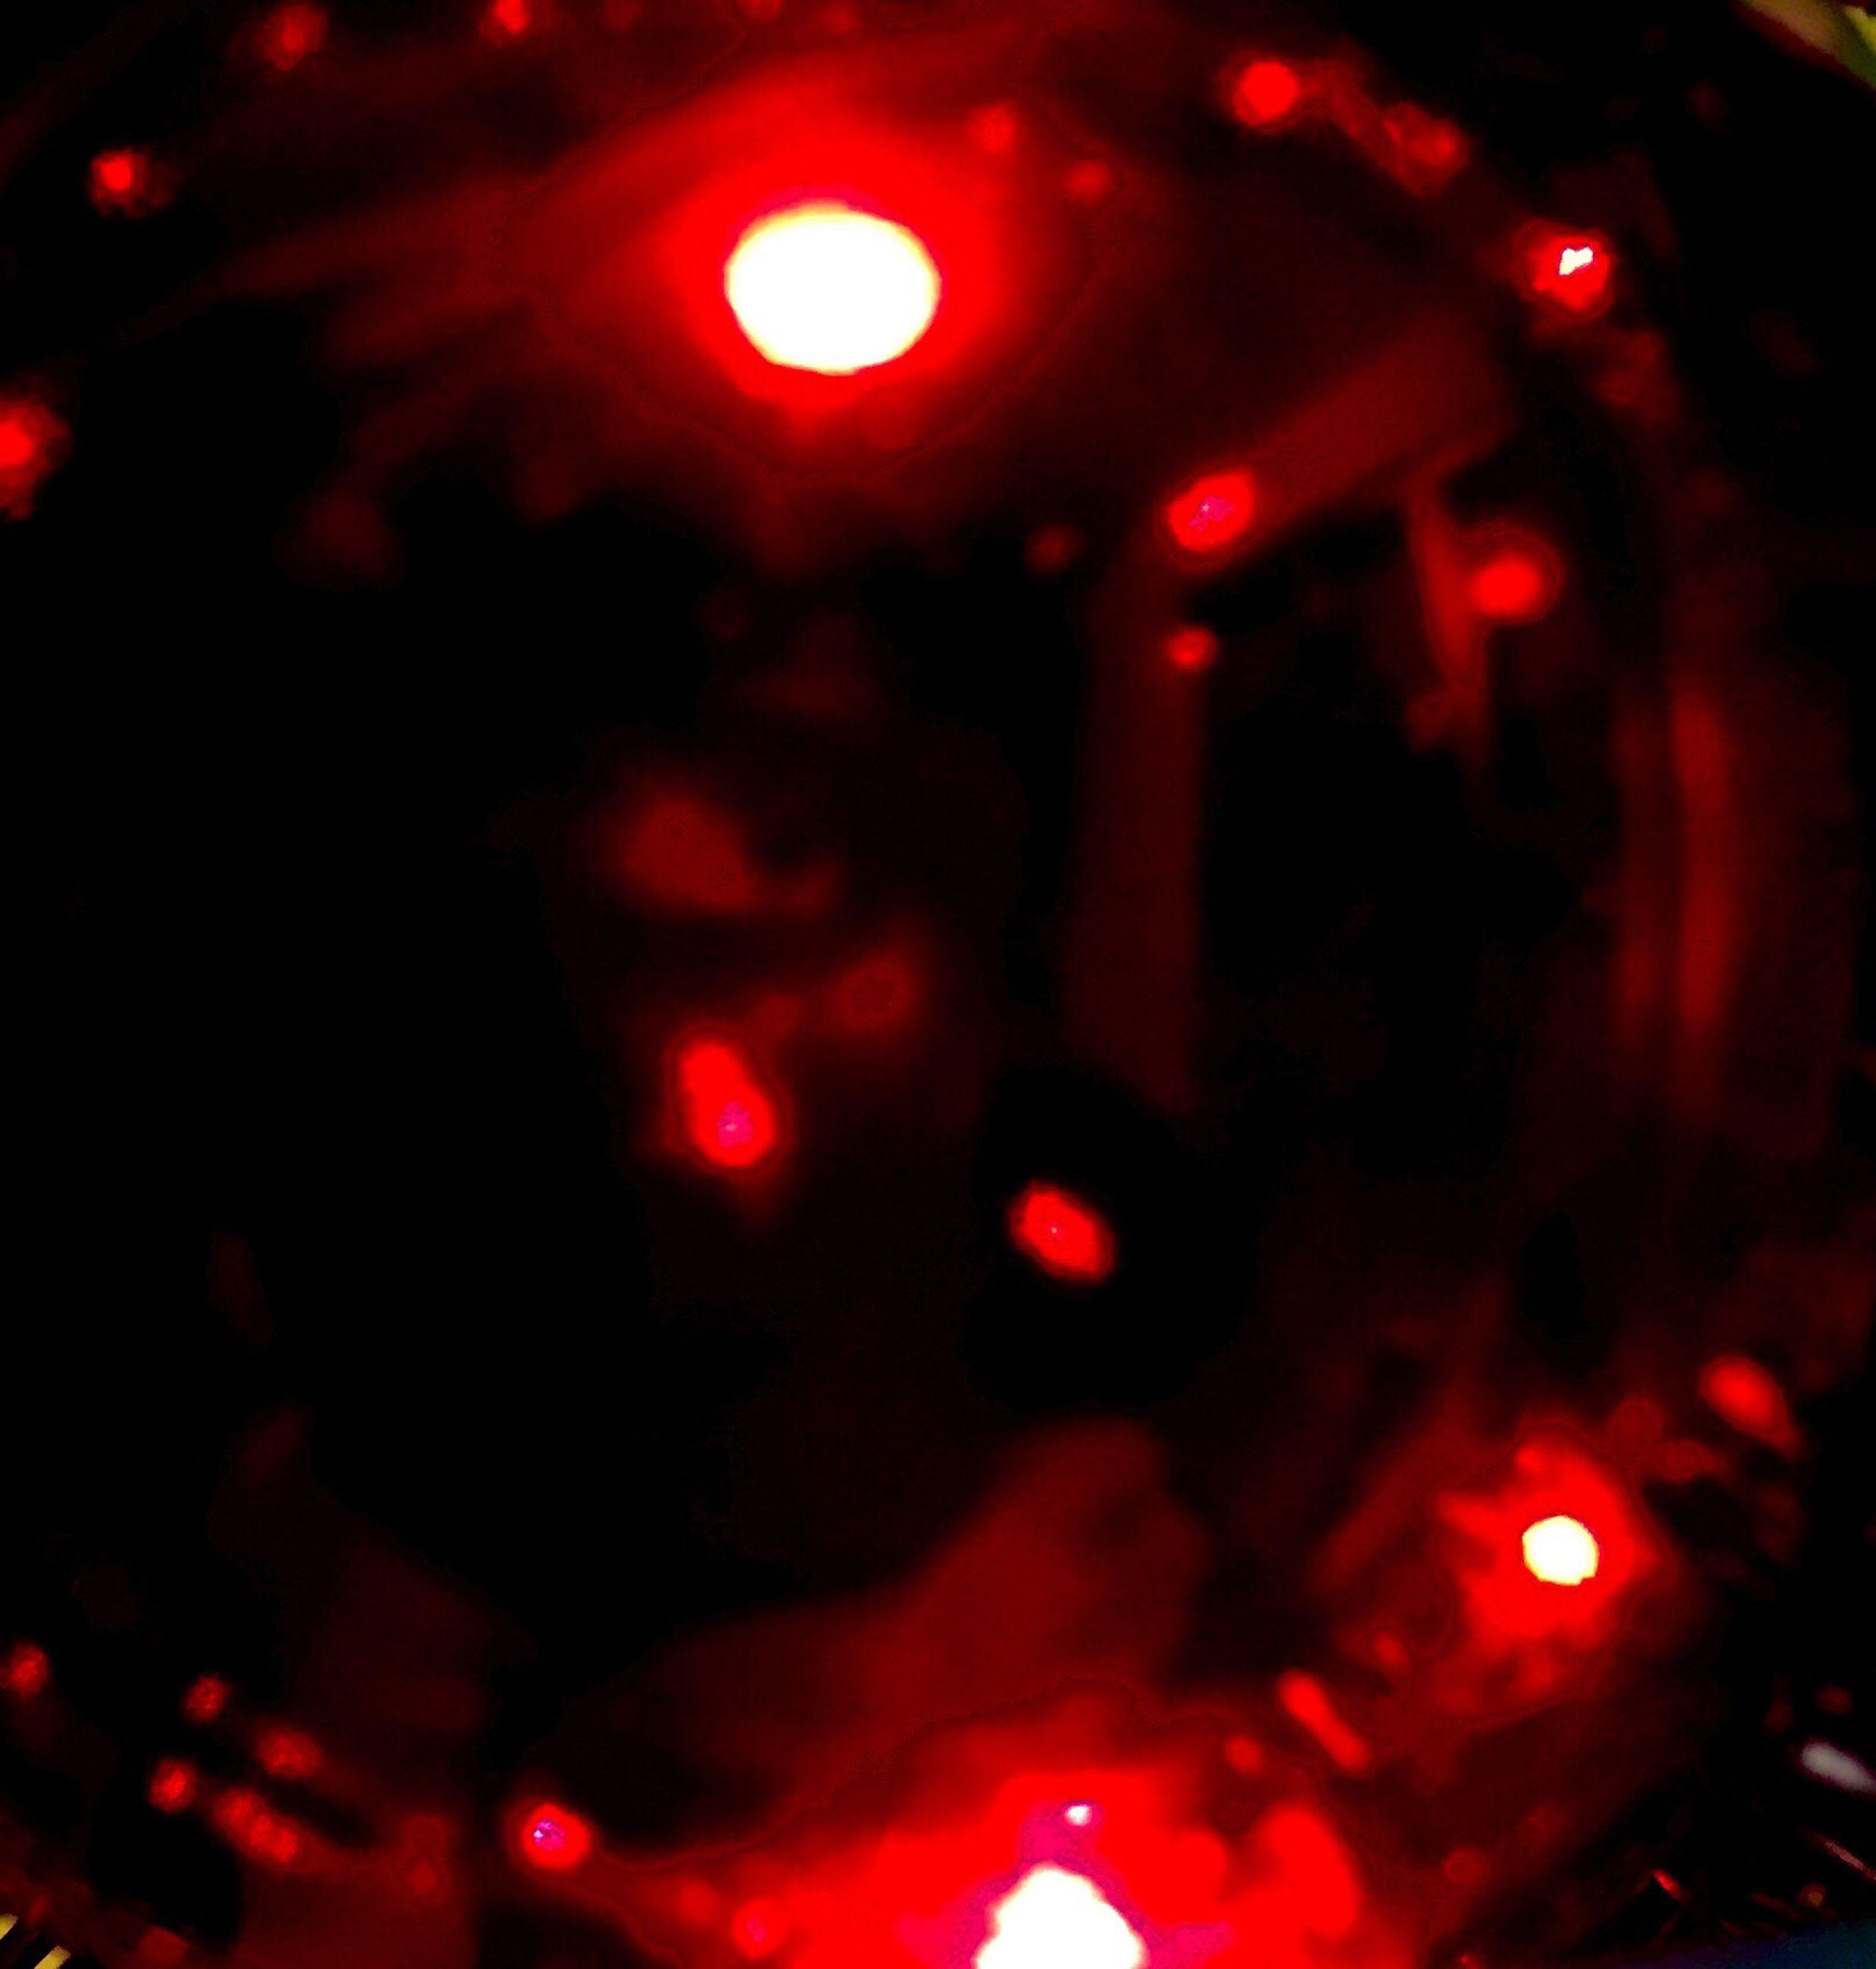 illuminated, red, night, lighting equipment, defocused, indoors, glowing, lens flare, light - natural phenomenon, close-up, no people, celebration, dark, focus on foreground, car, decoration, selective focus, multi colored, transportation